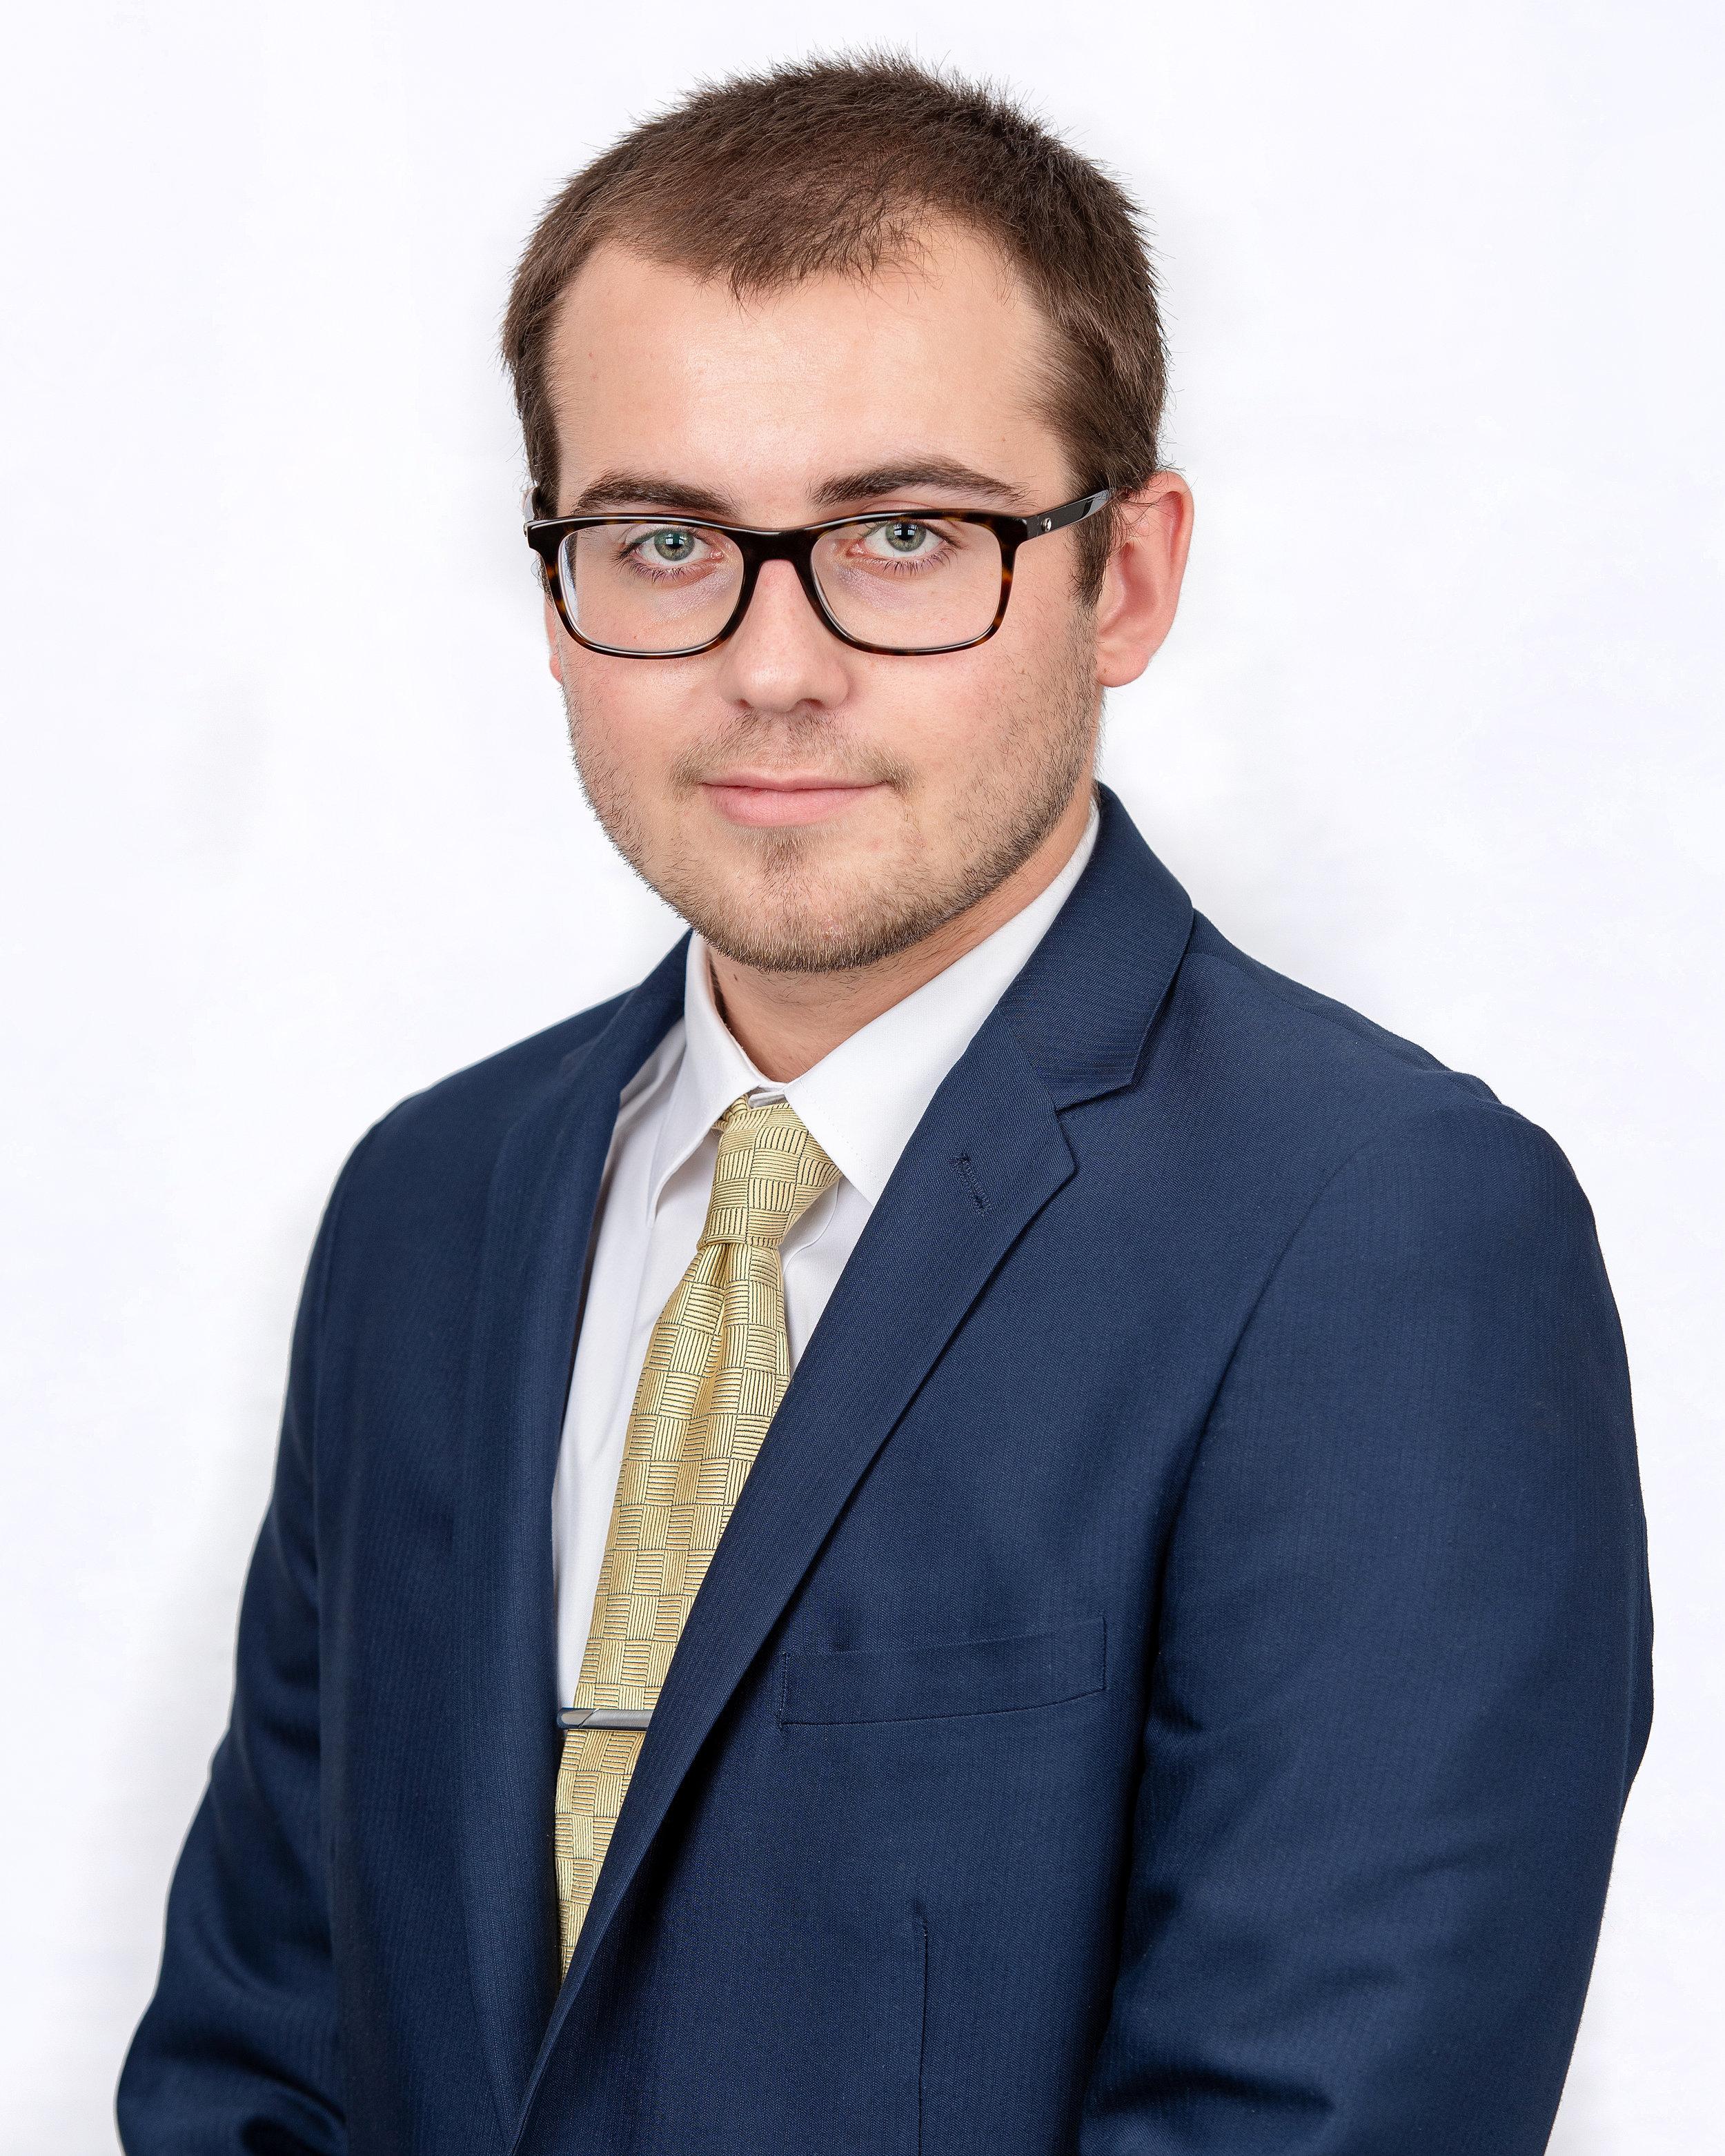 Nicholas Ozyp   Quantitative Analyst